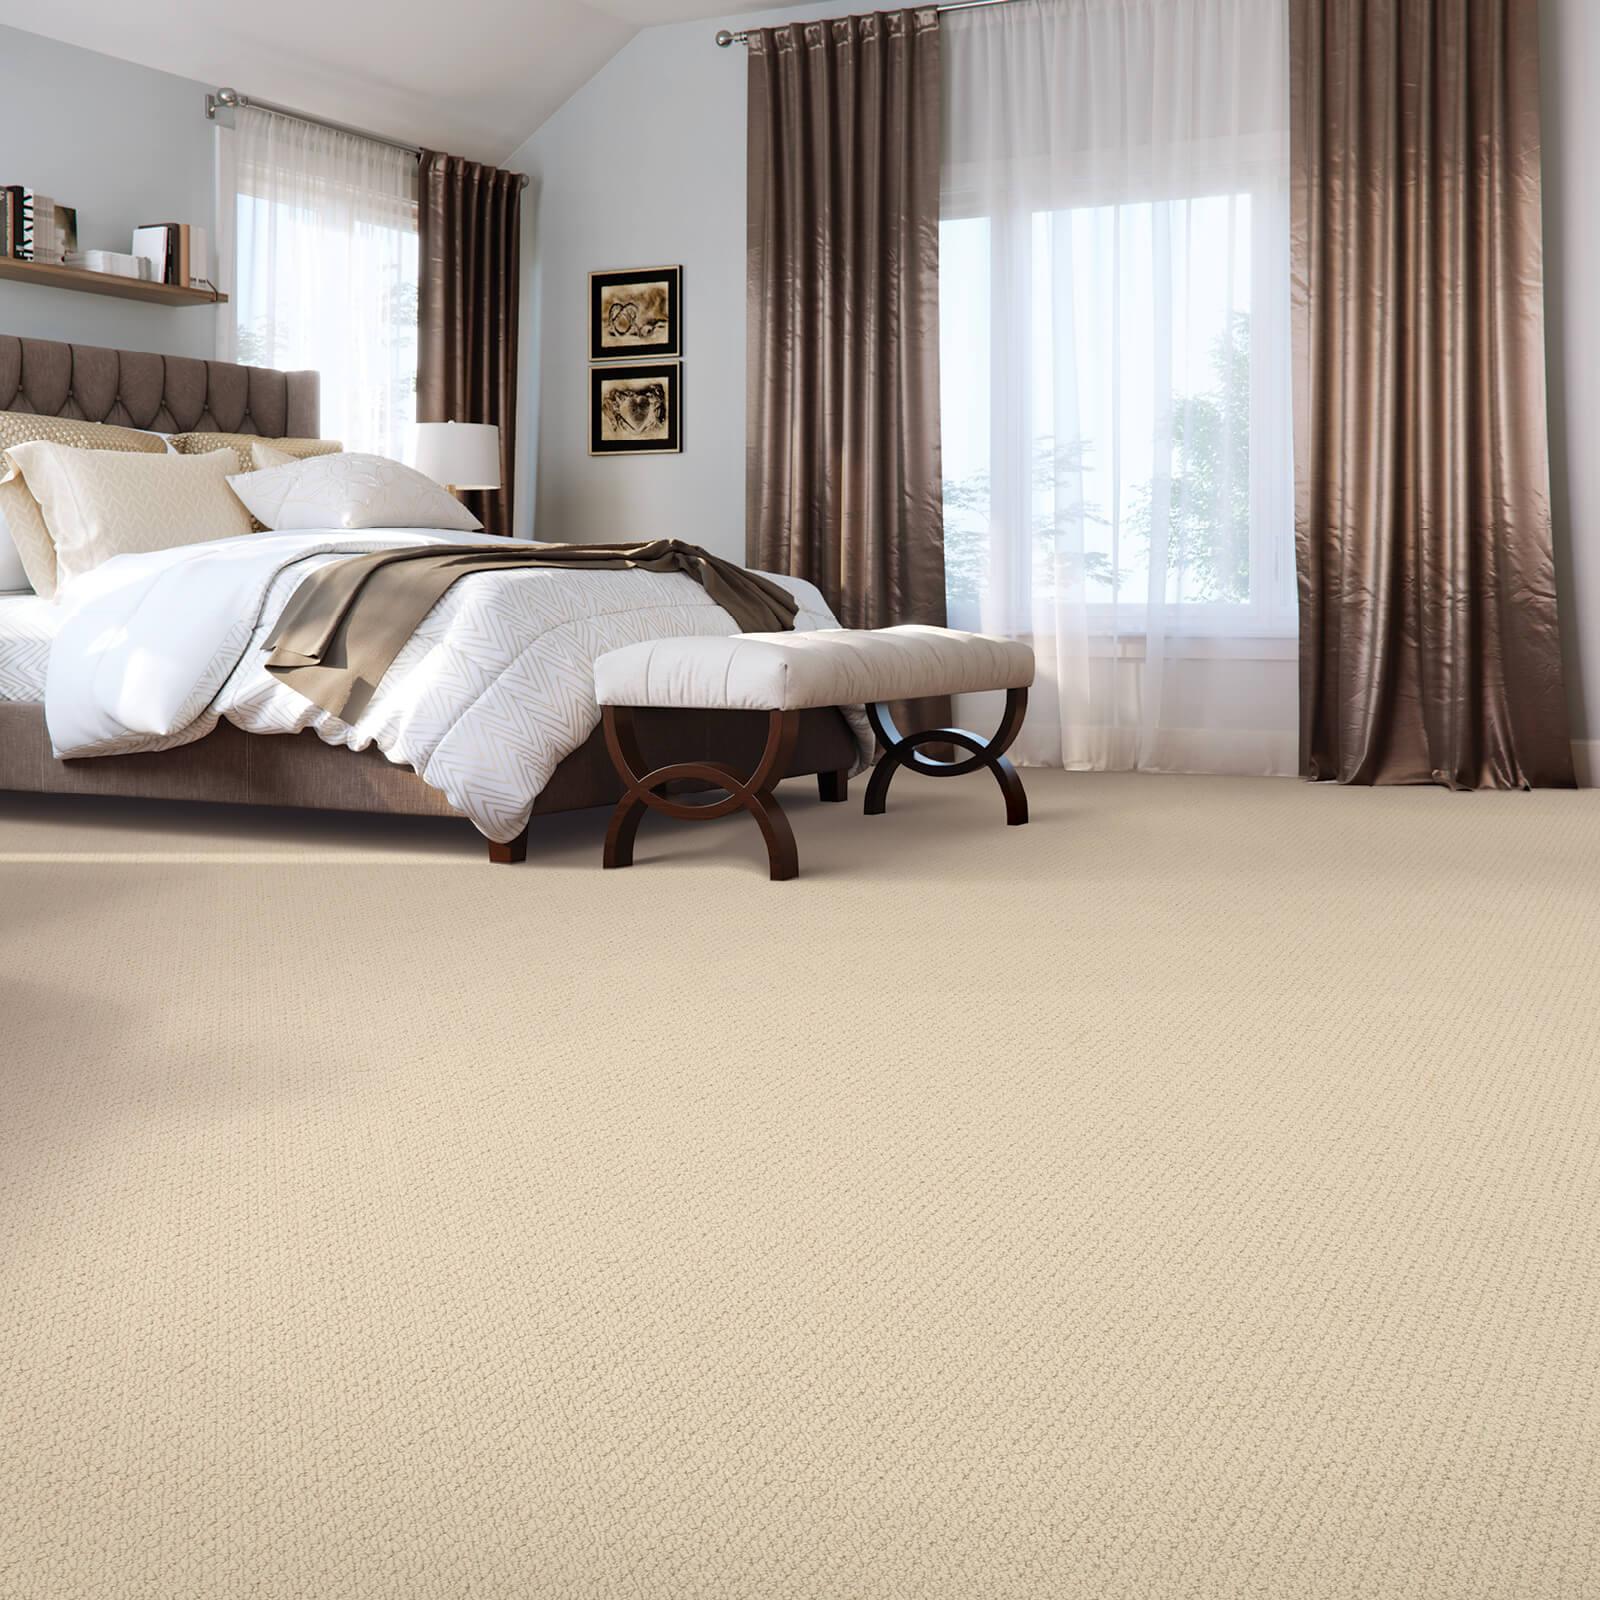 Spacious bedroom carpet flooring | Shans Carpets And Fine Flooring Inc